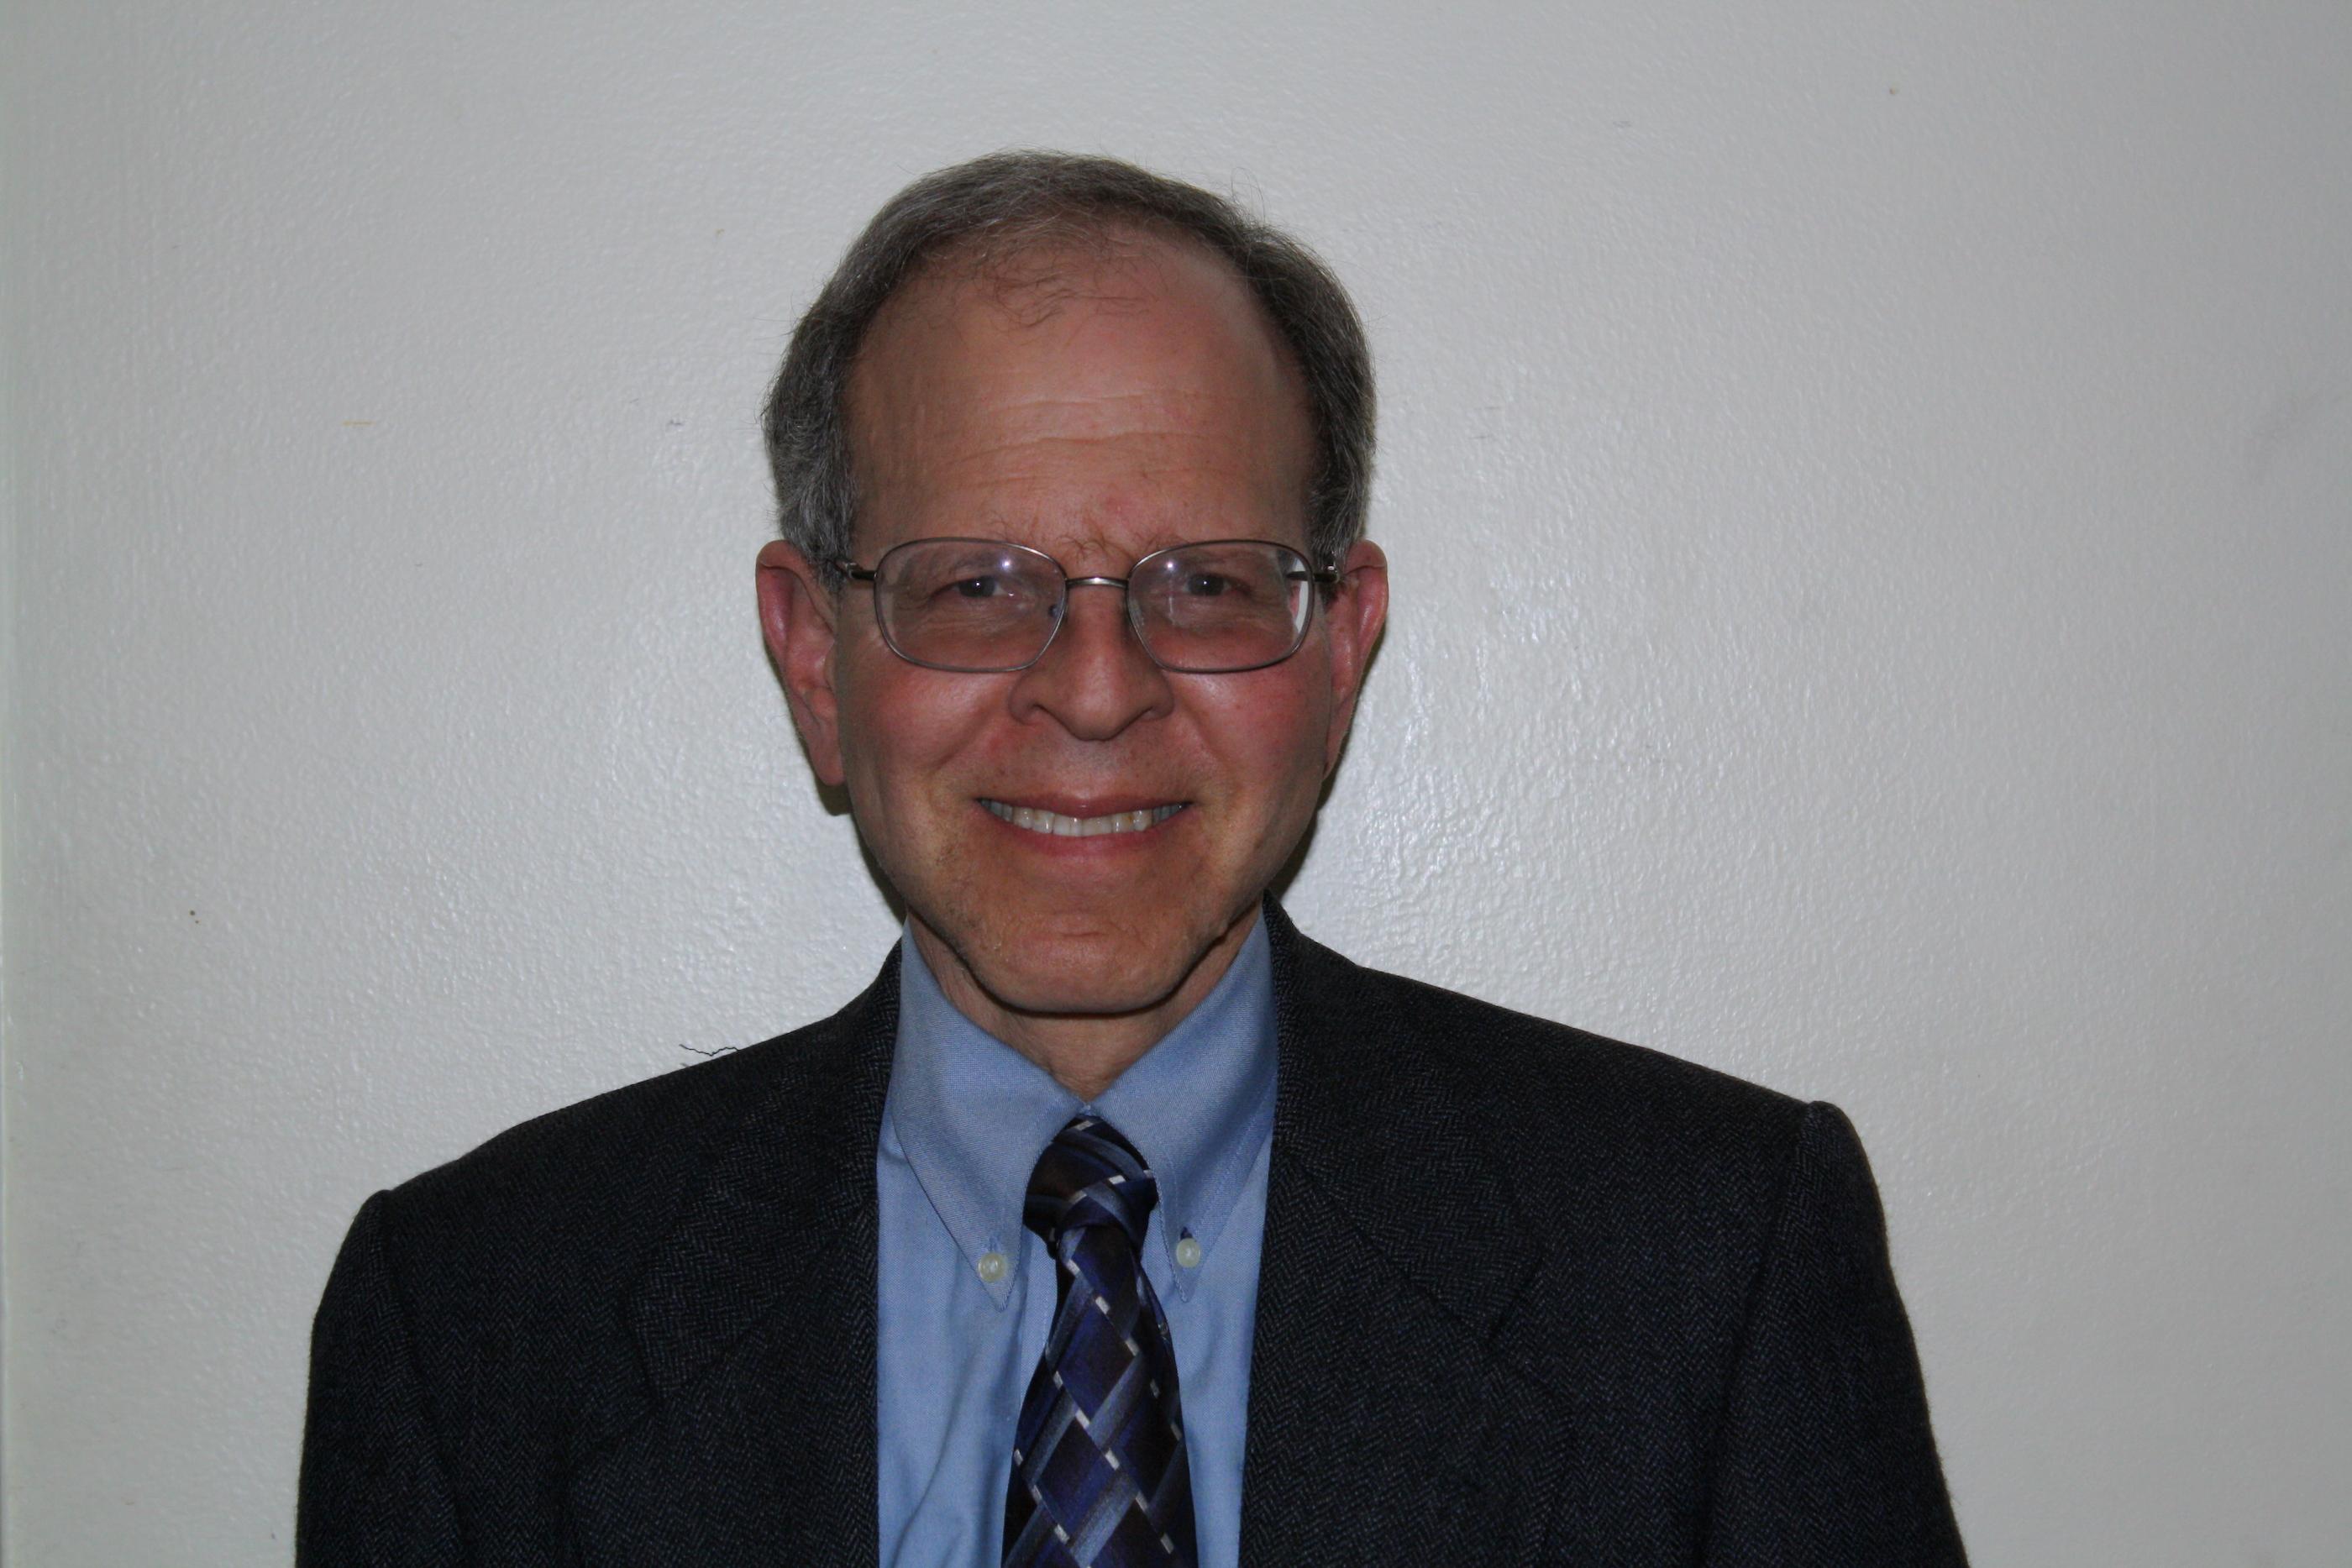 Michael Dine